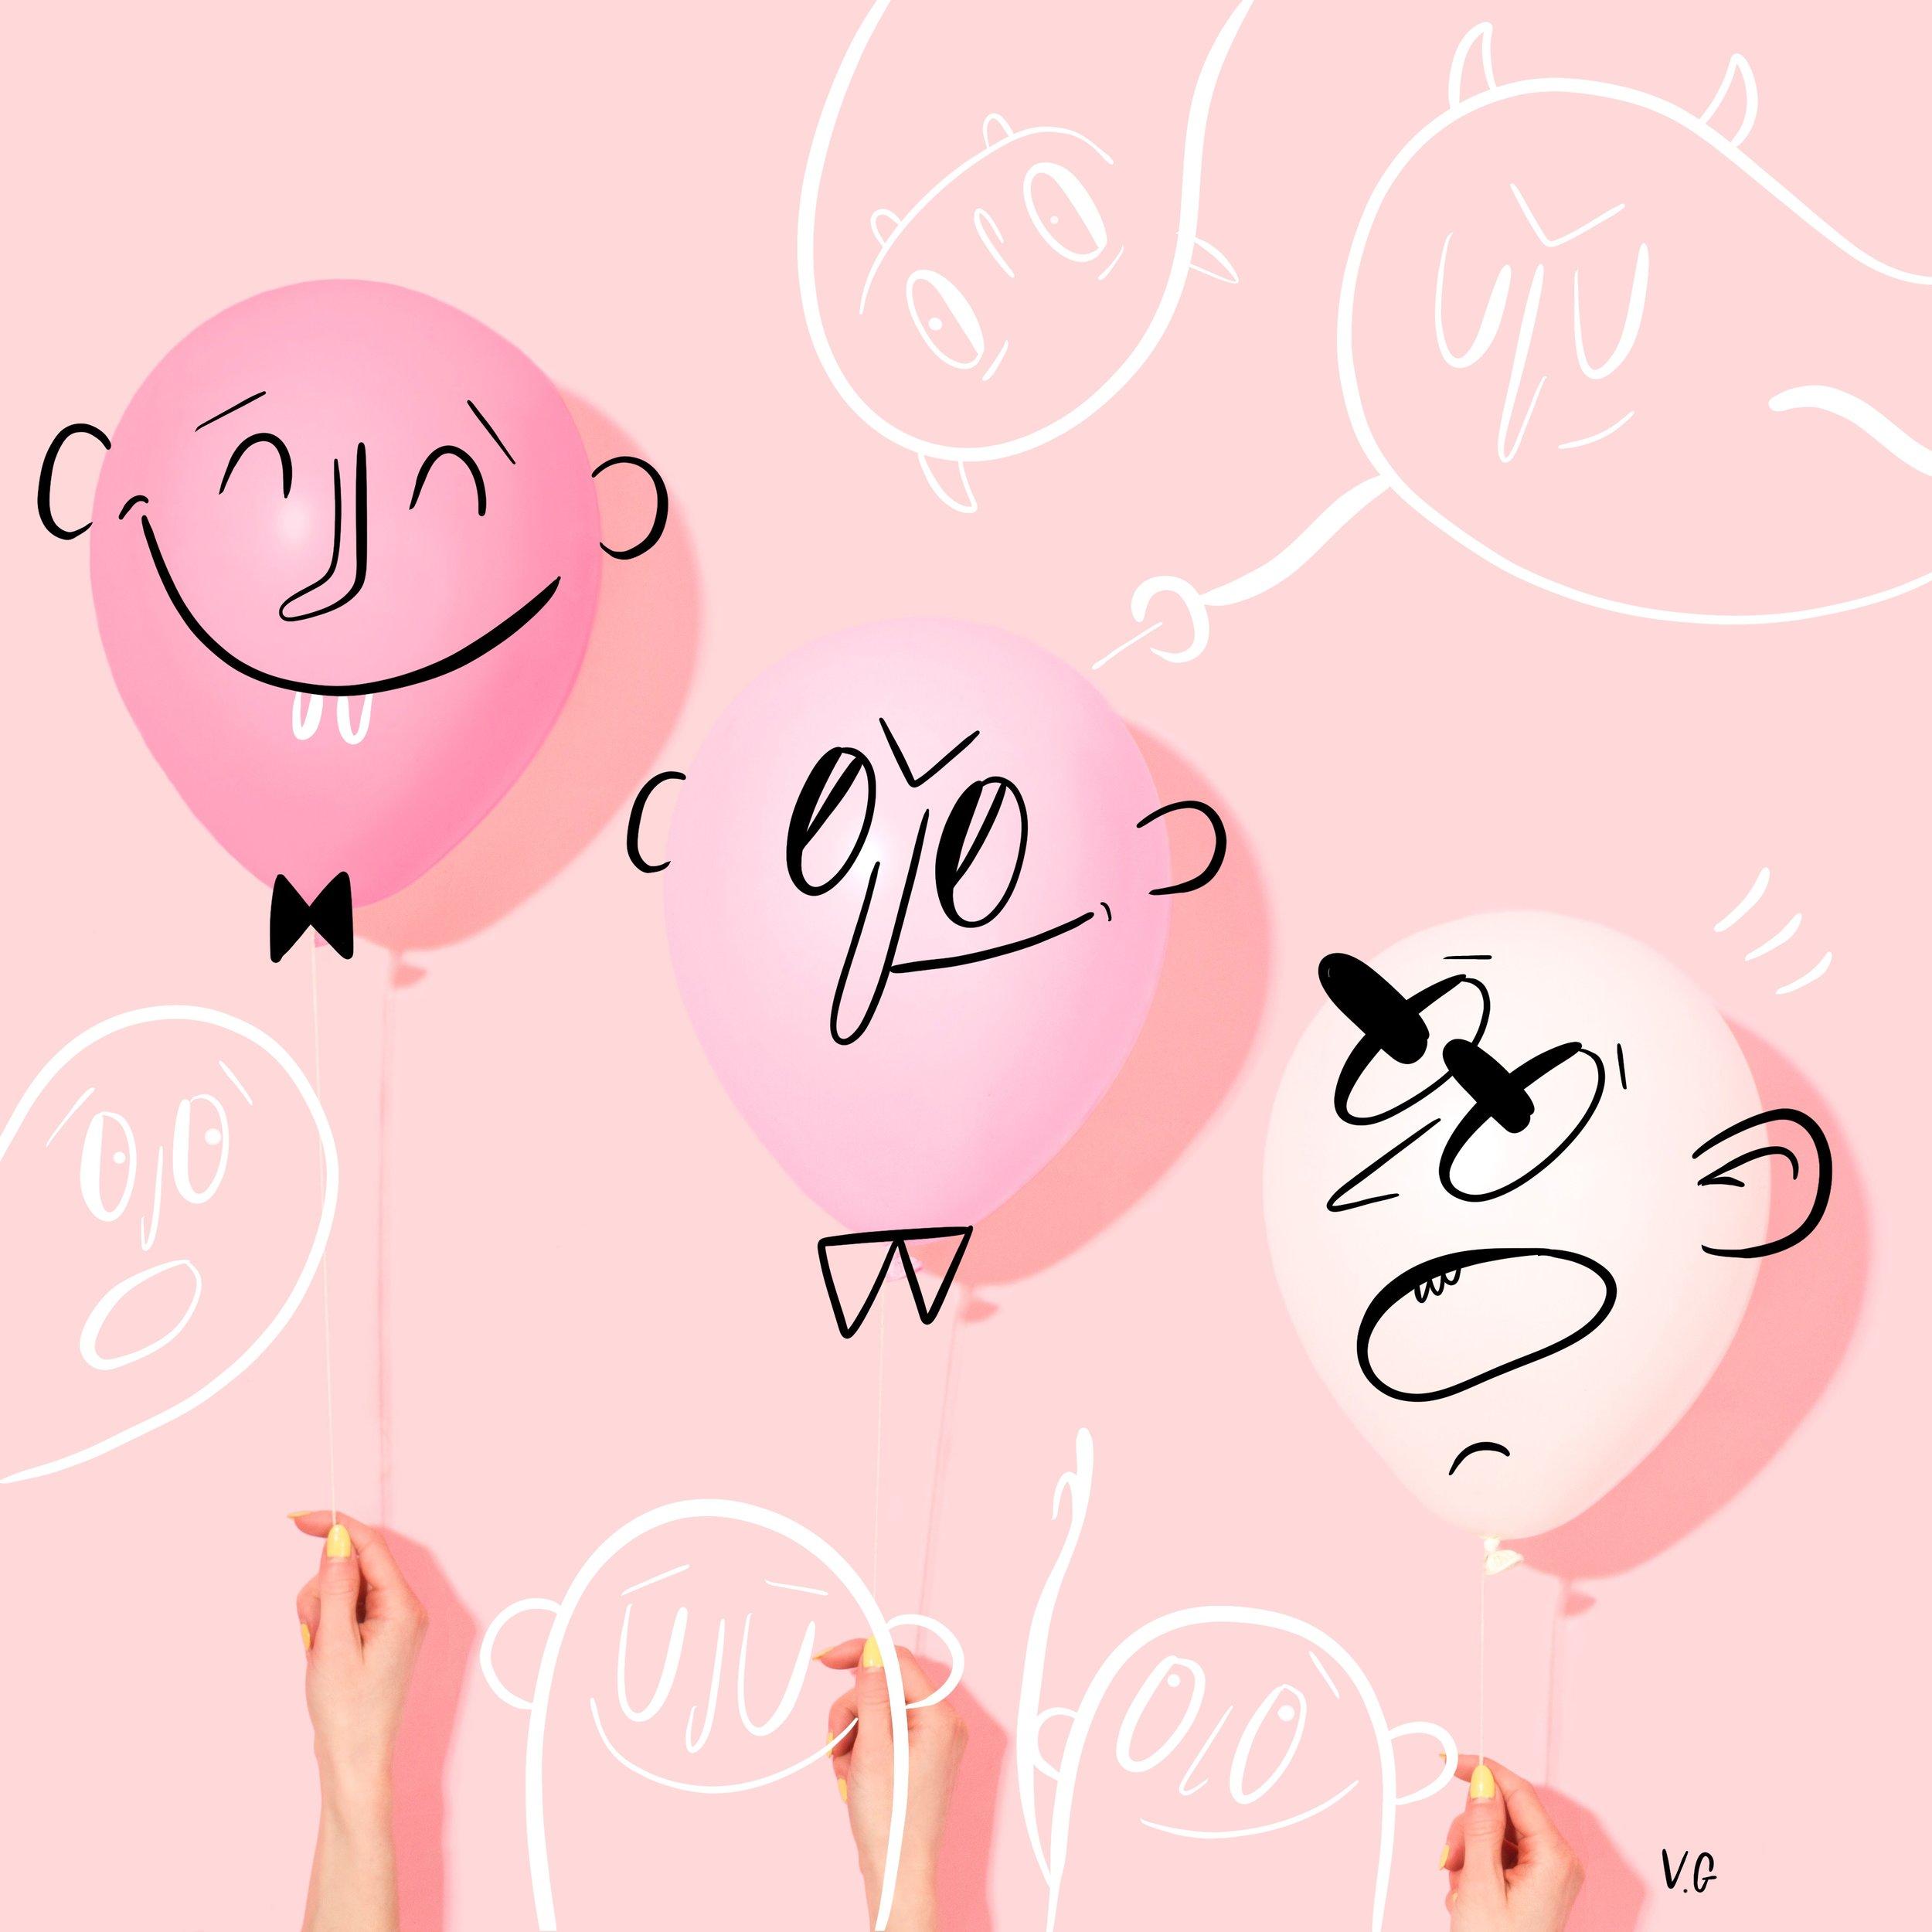 Photo Amy Shamblen and illustration by Valéry Goulet